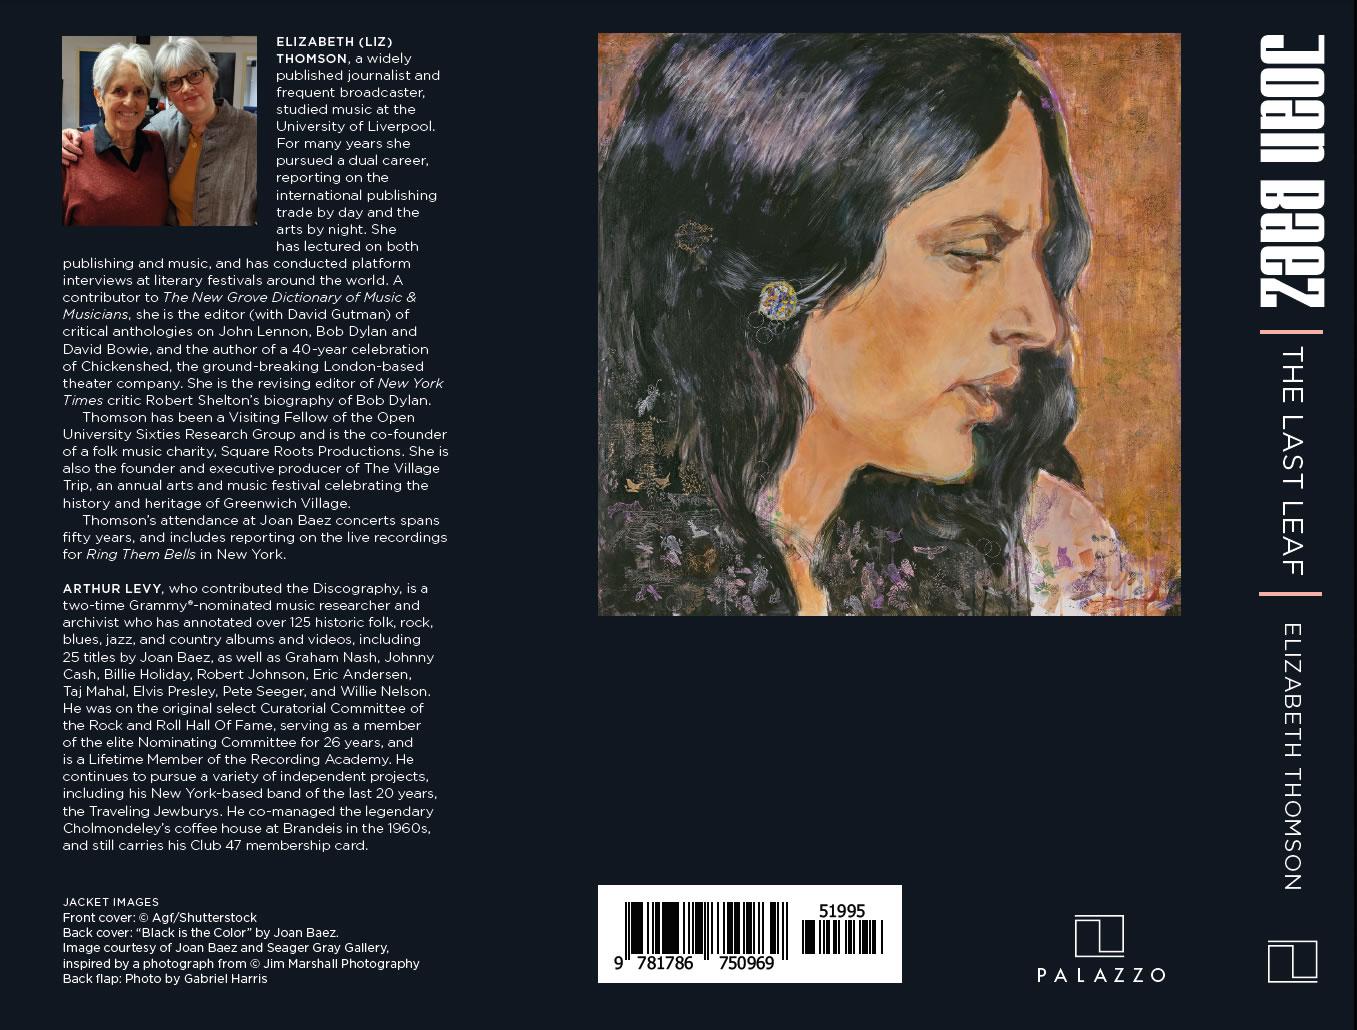 Joan Baez The Last Leaf back cover